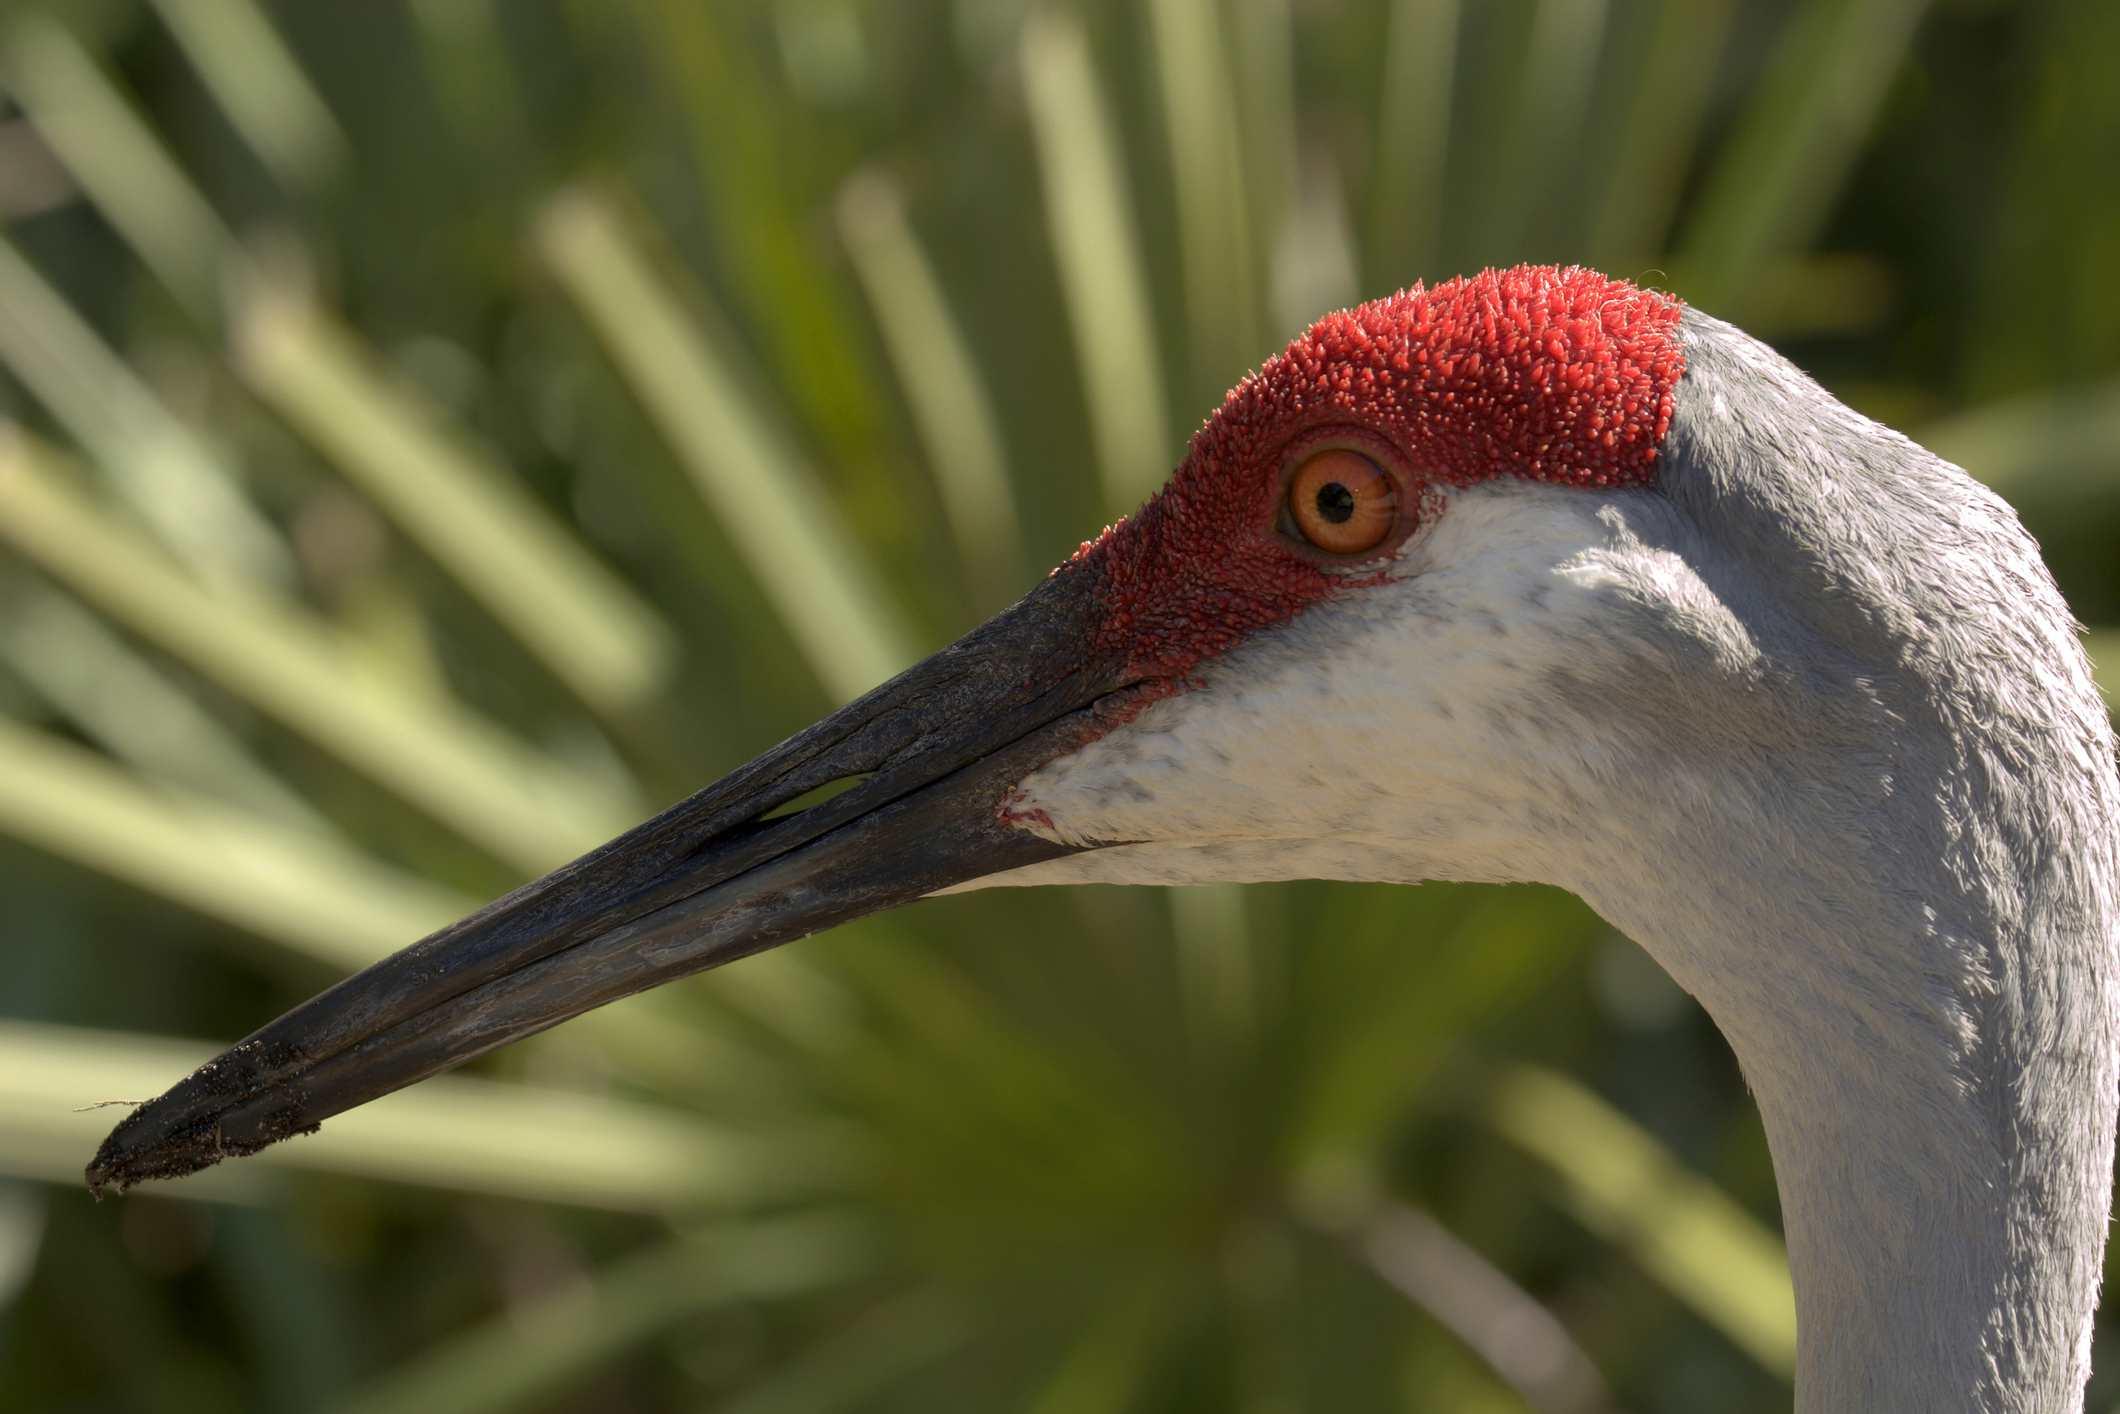 Okeeheelee Nature Center West Palm Beach